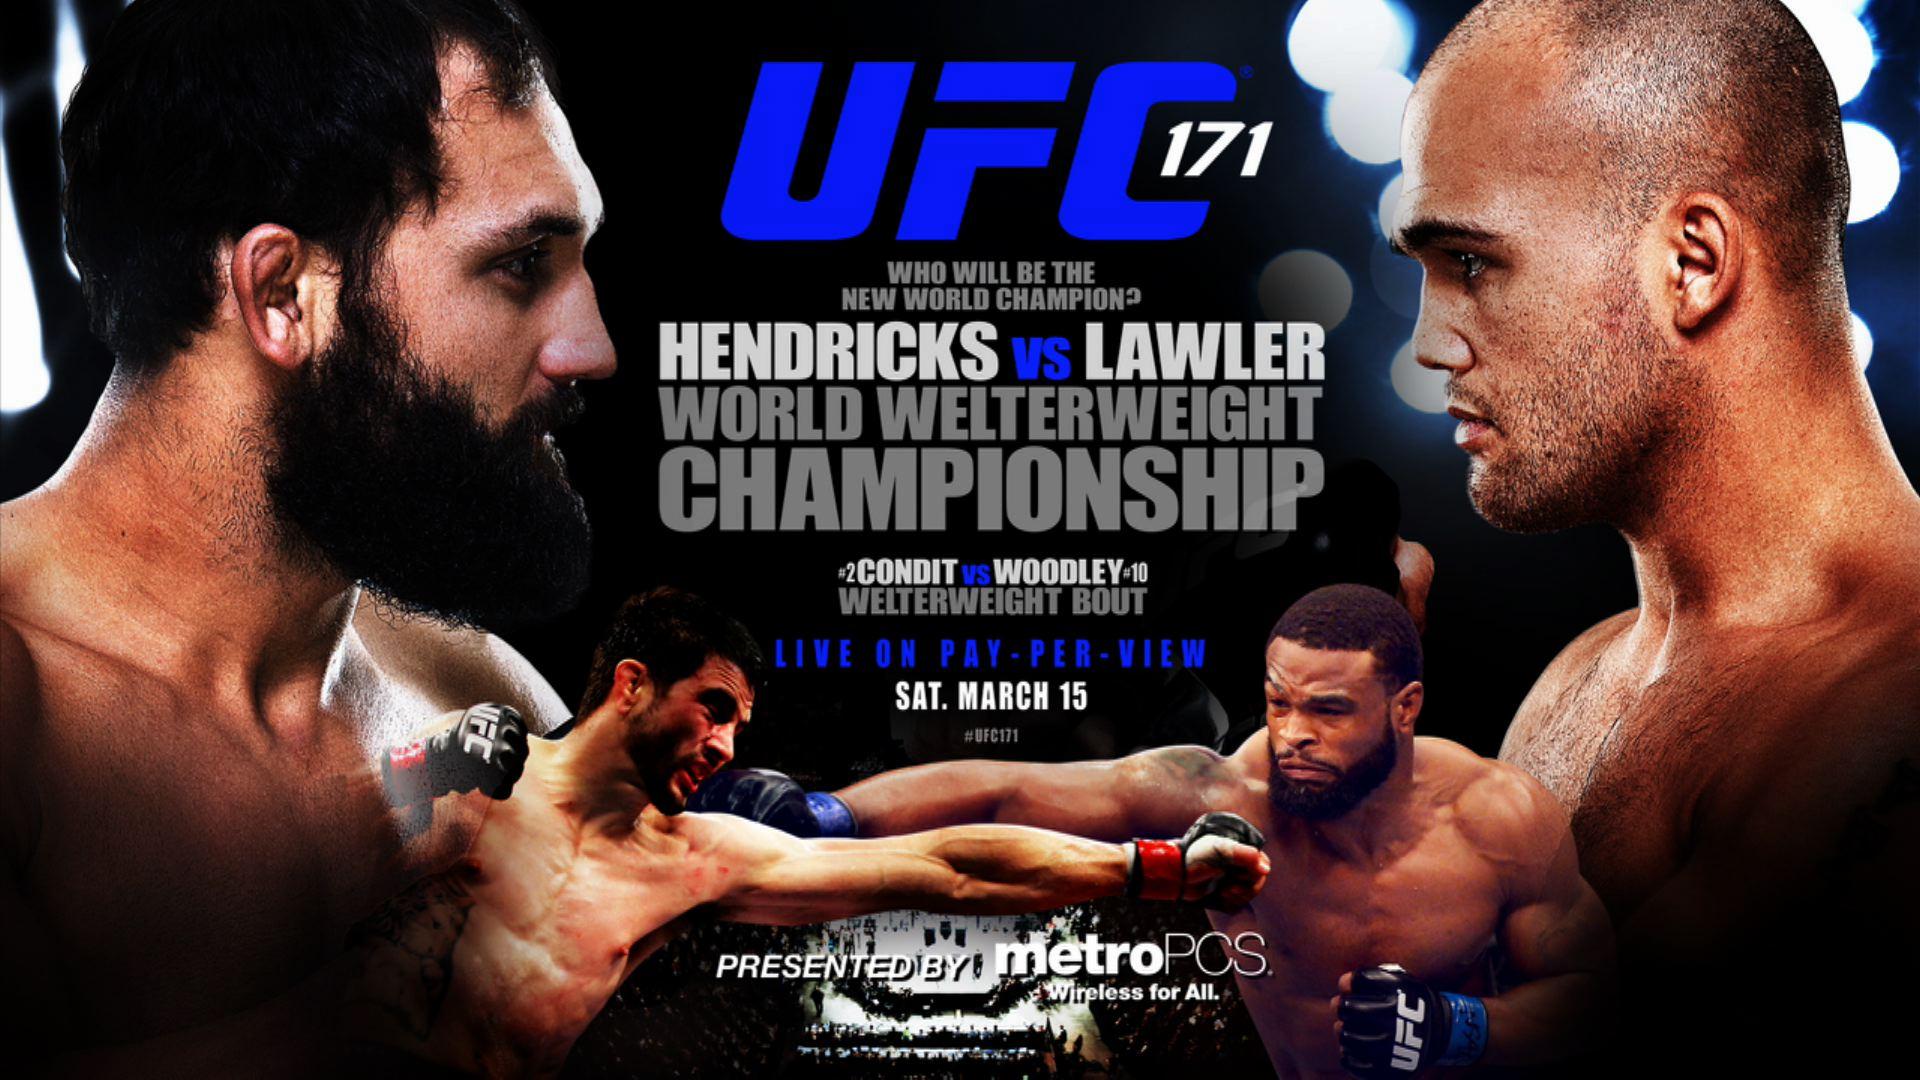 UFC 171  UFC 171